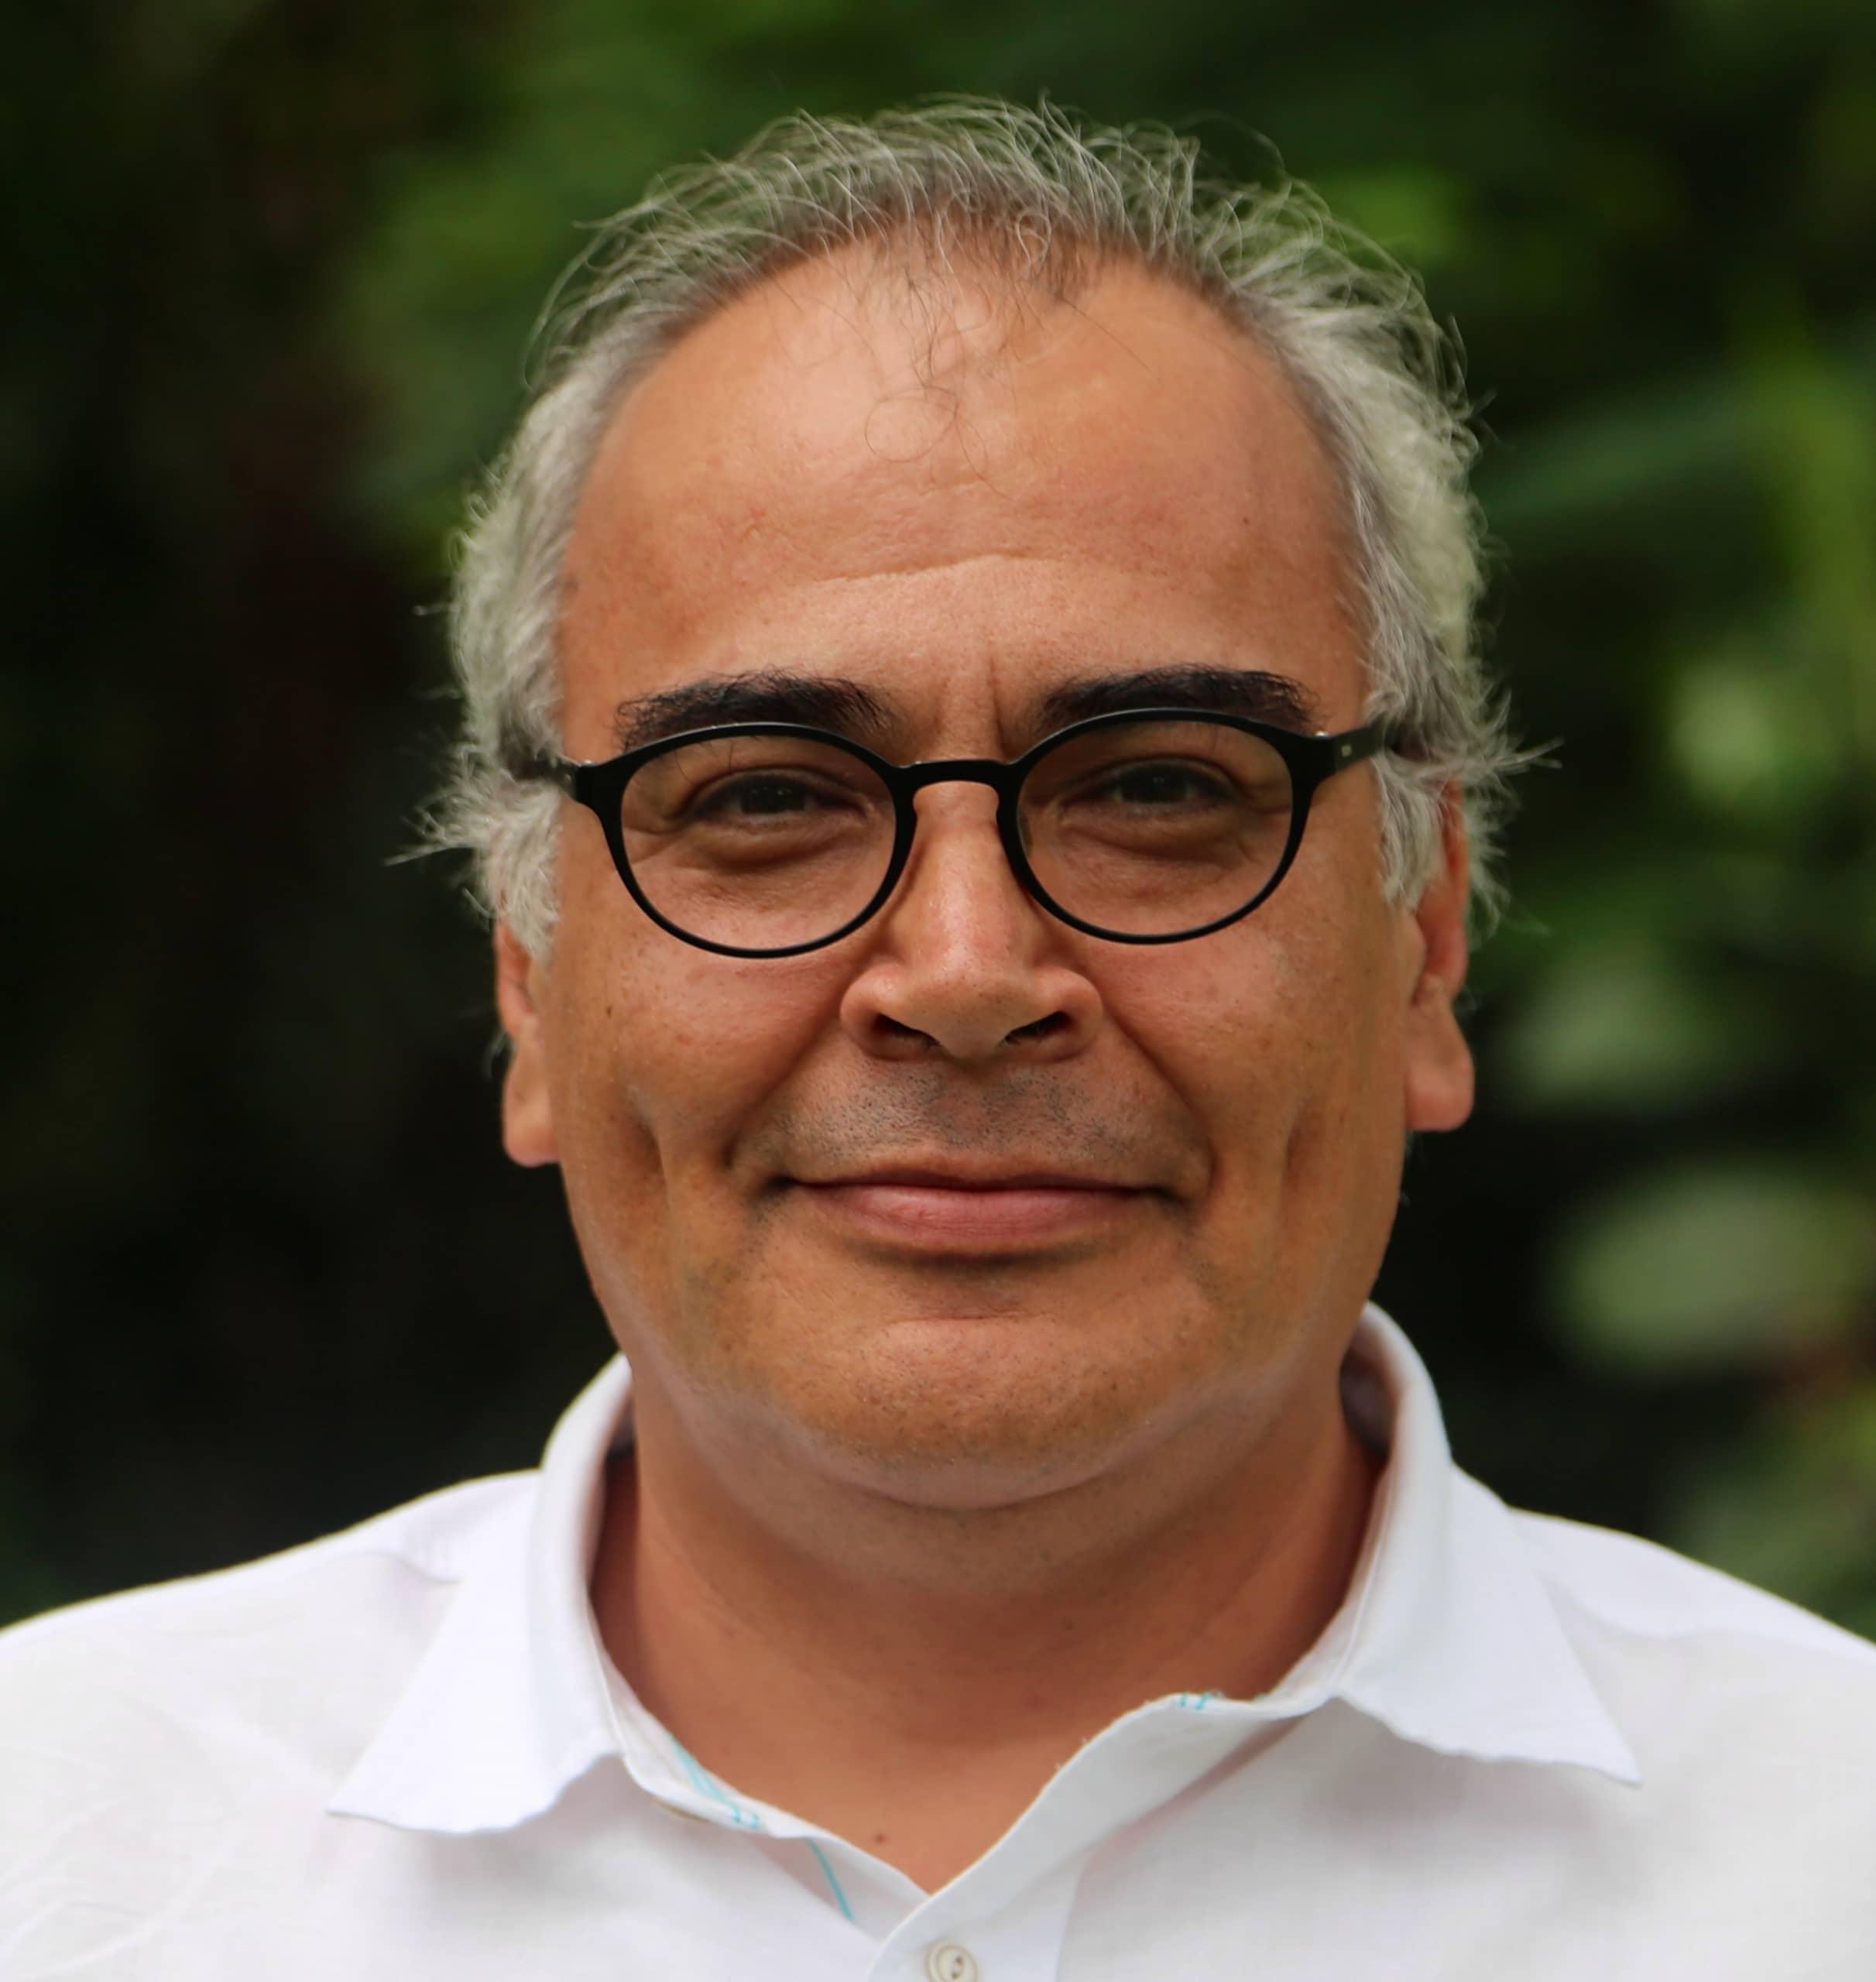 Pablo Pacheco